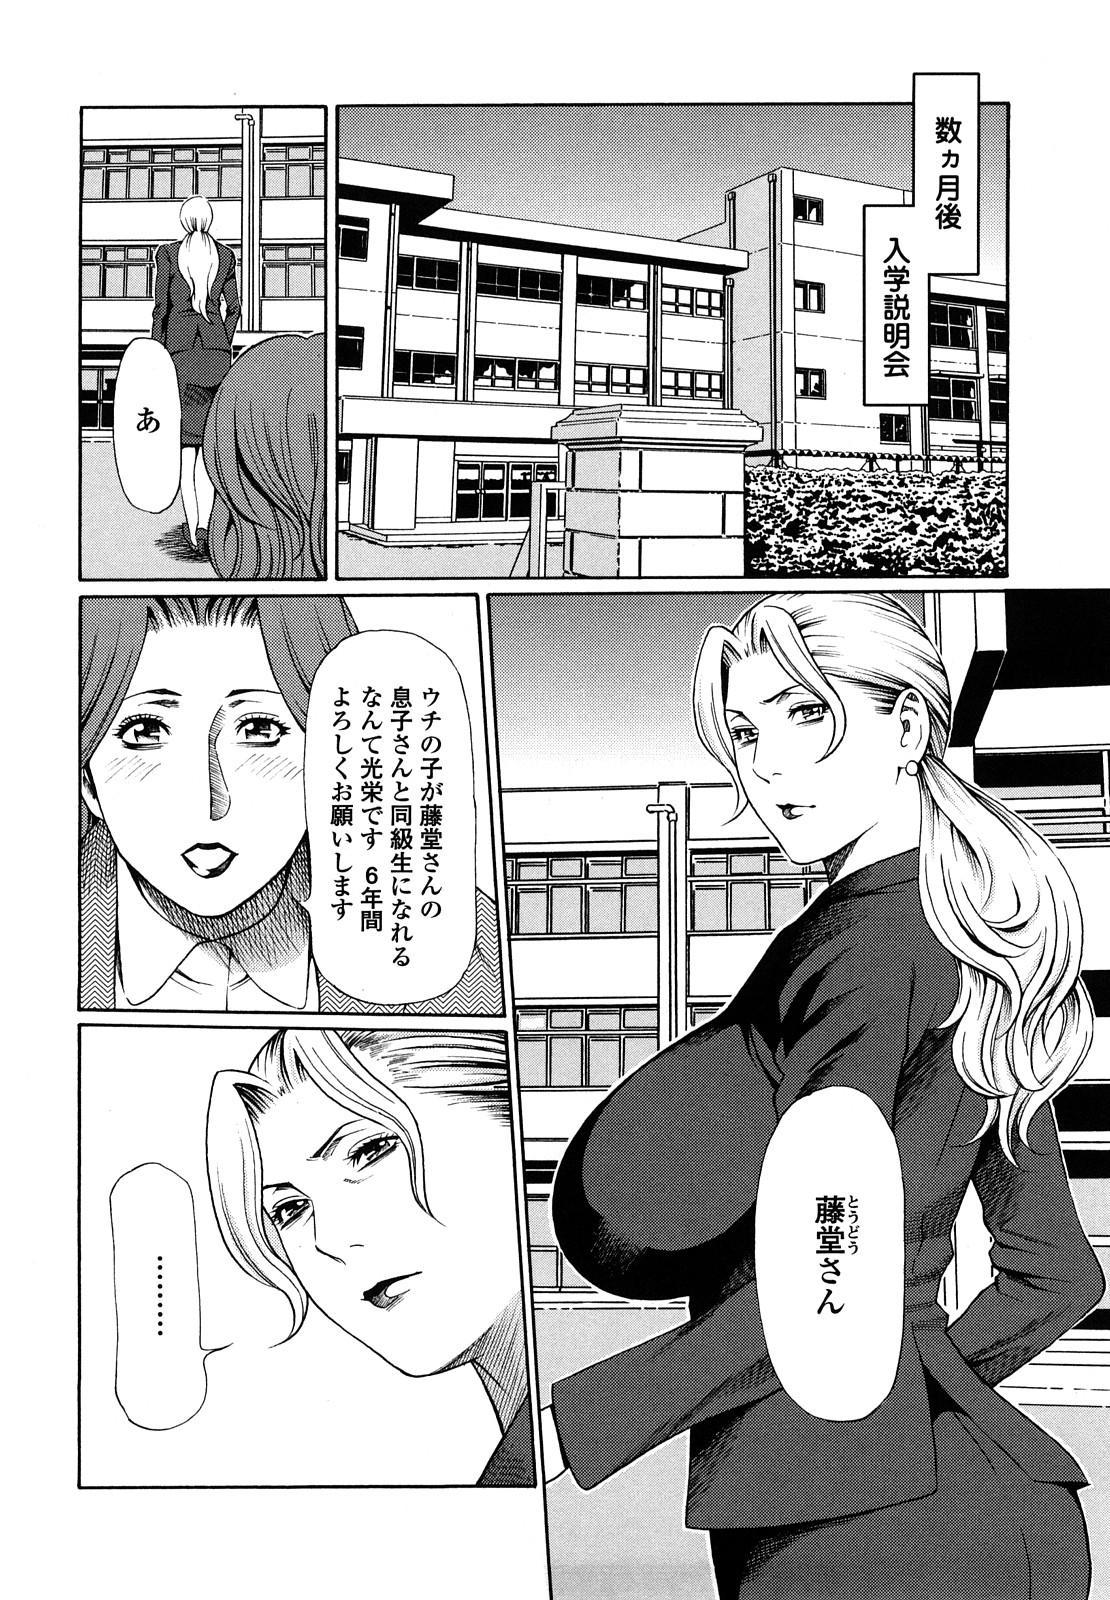 [Takasugi Kou] Kindan no Haha-Ana - Immorality Love-Hole [Decensored] 103